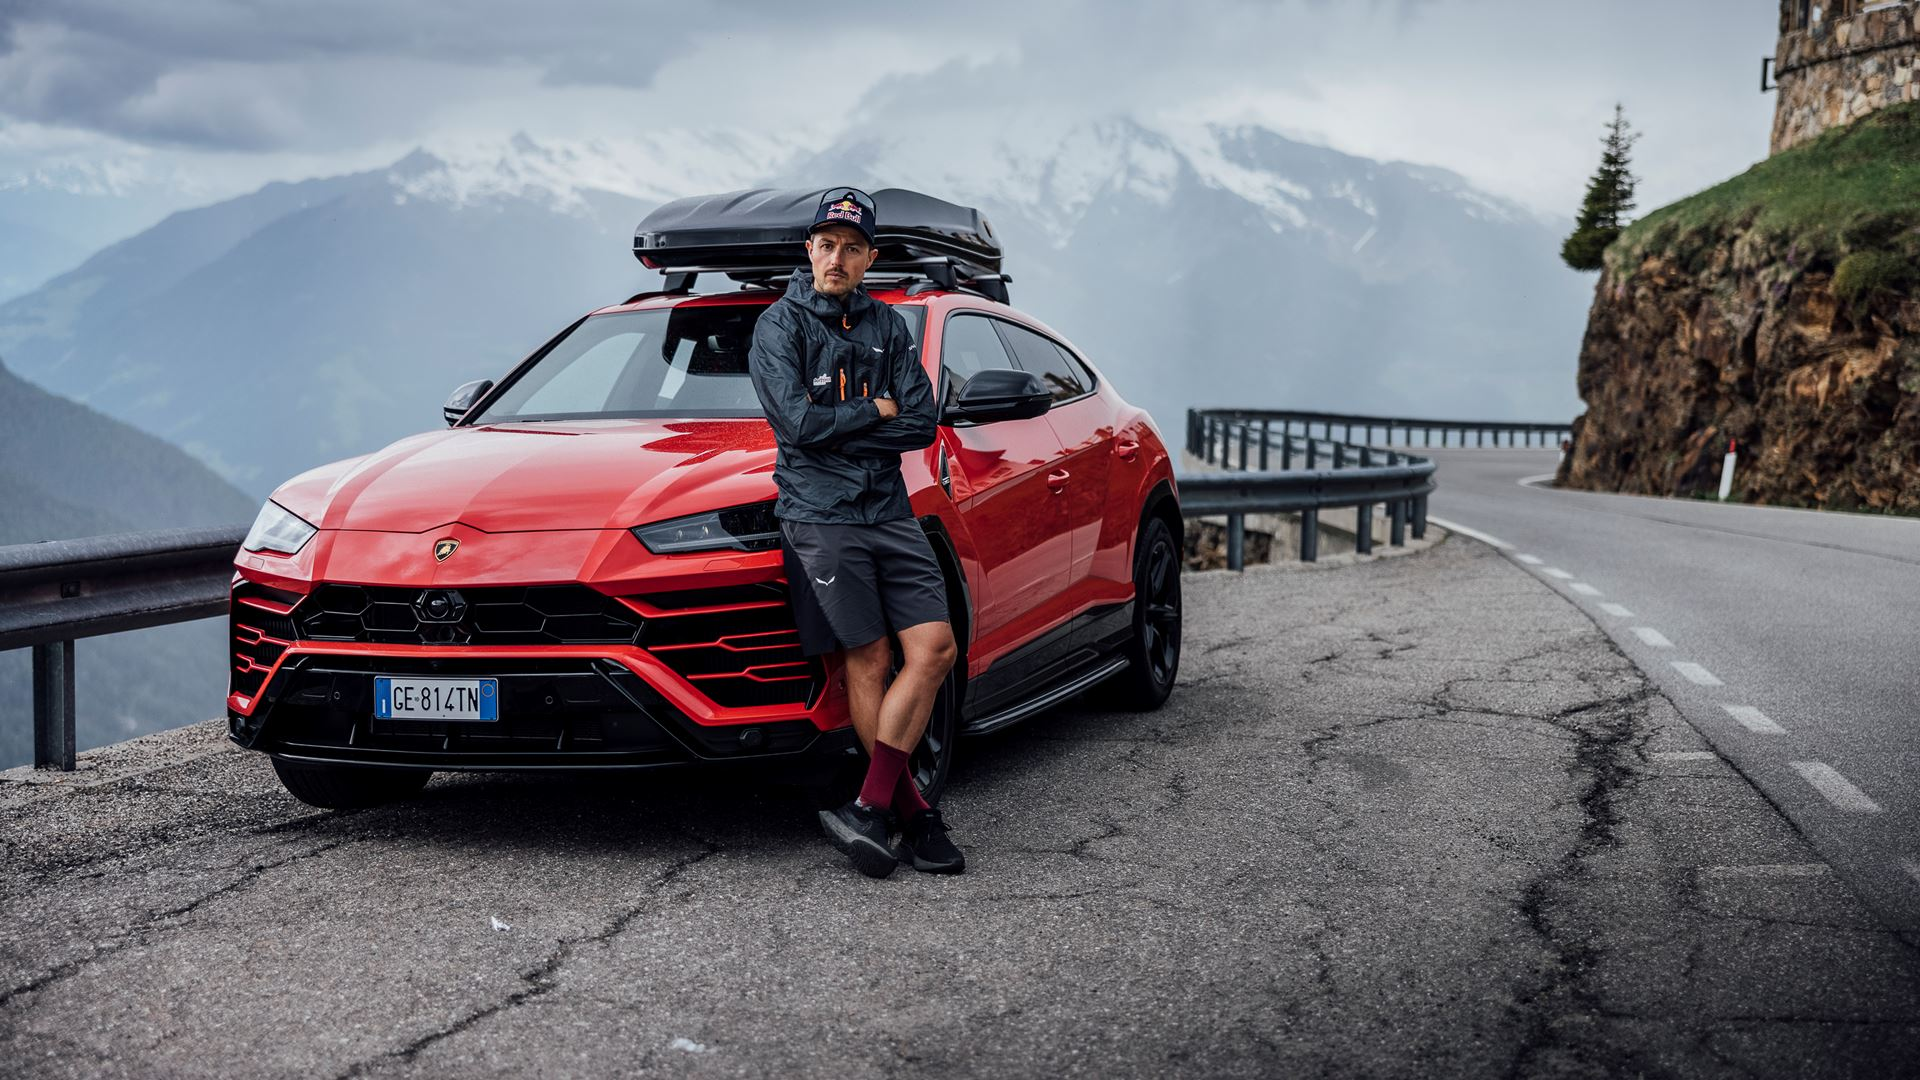 Lamborghini Urus and Aaron Durogati together for an extraordinary feat - Image 6